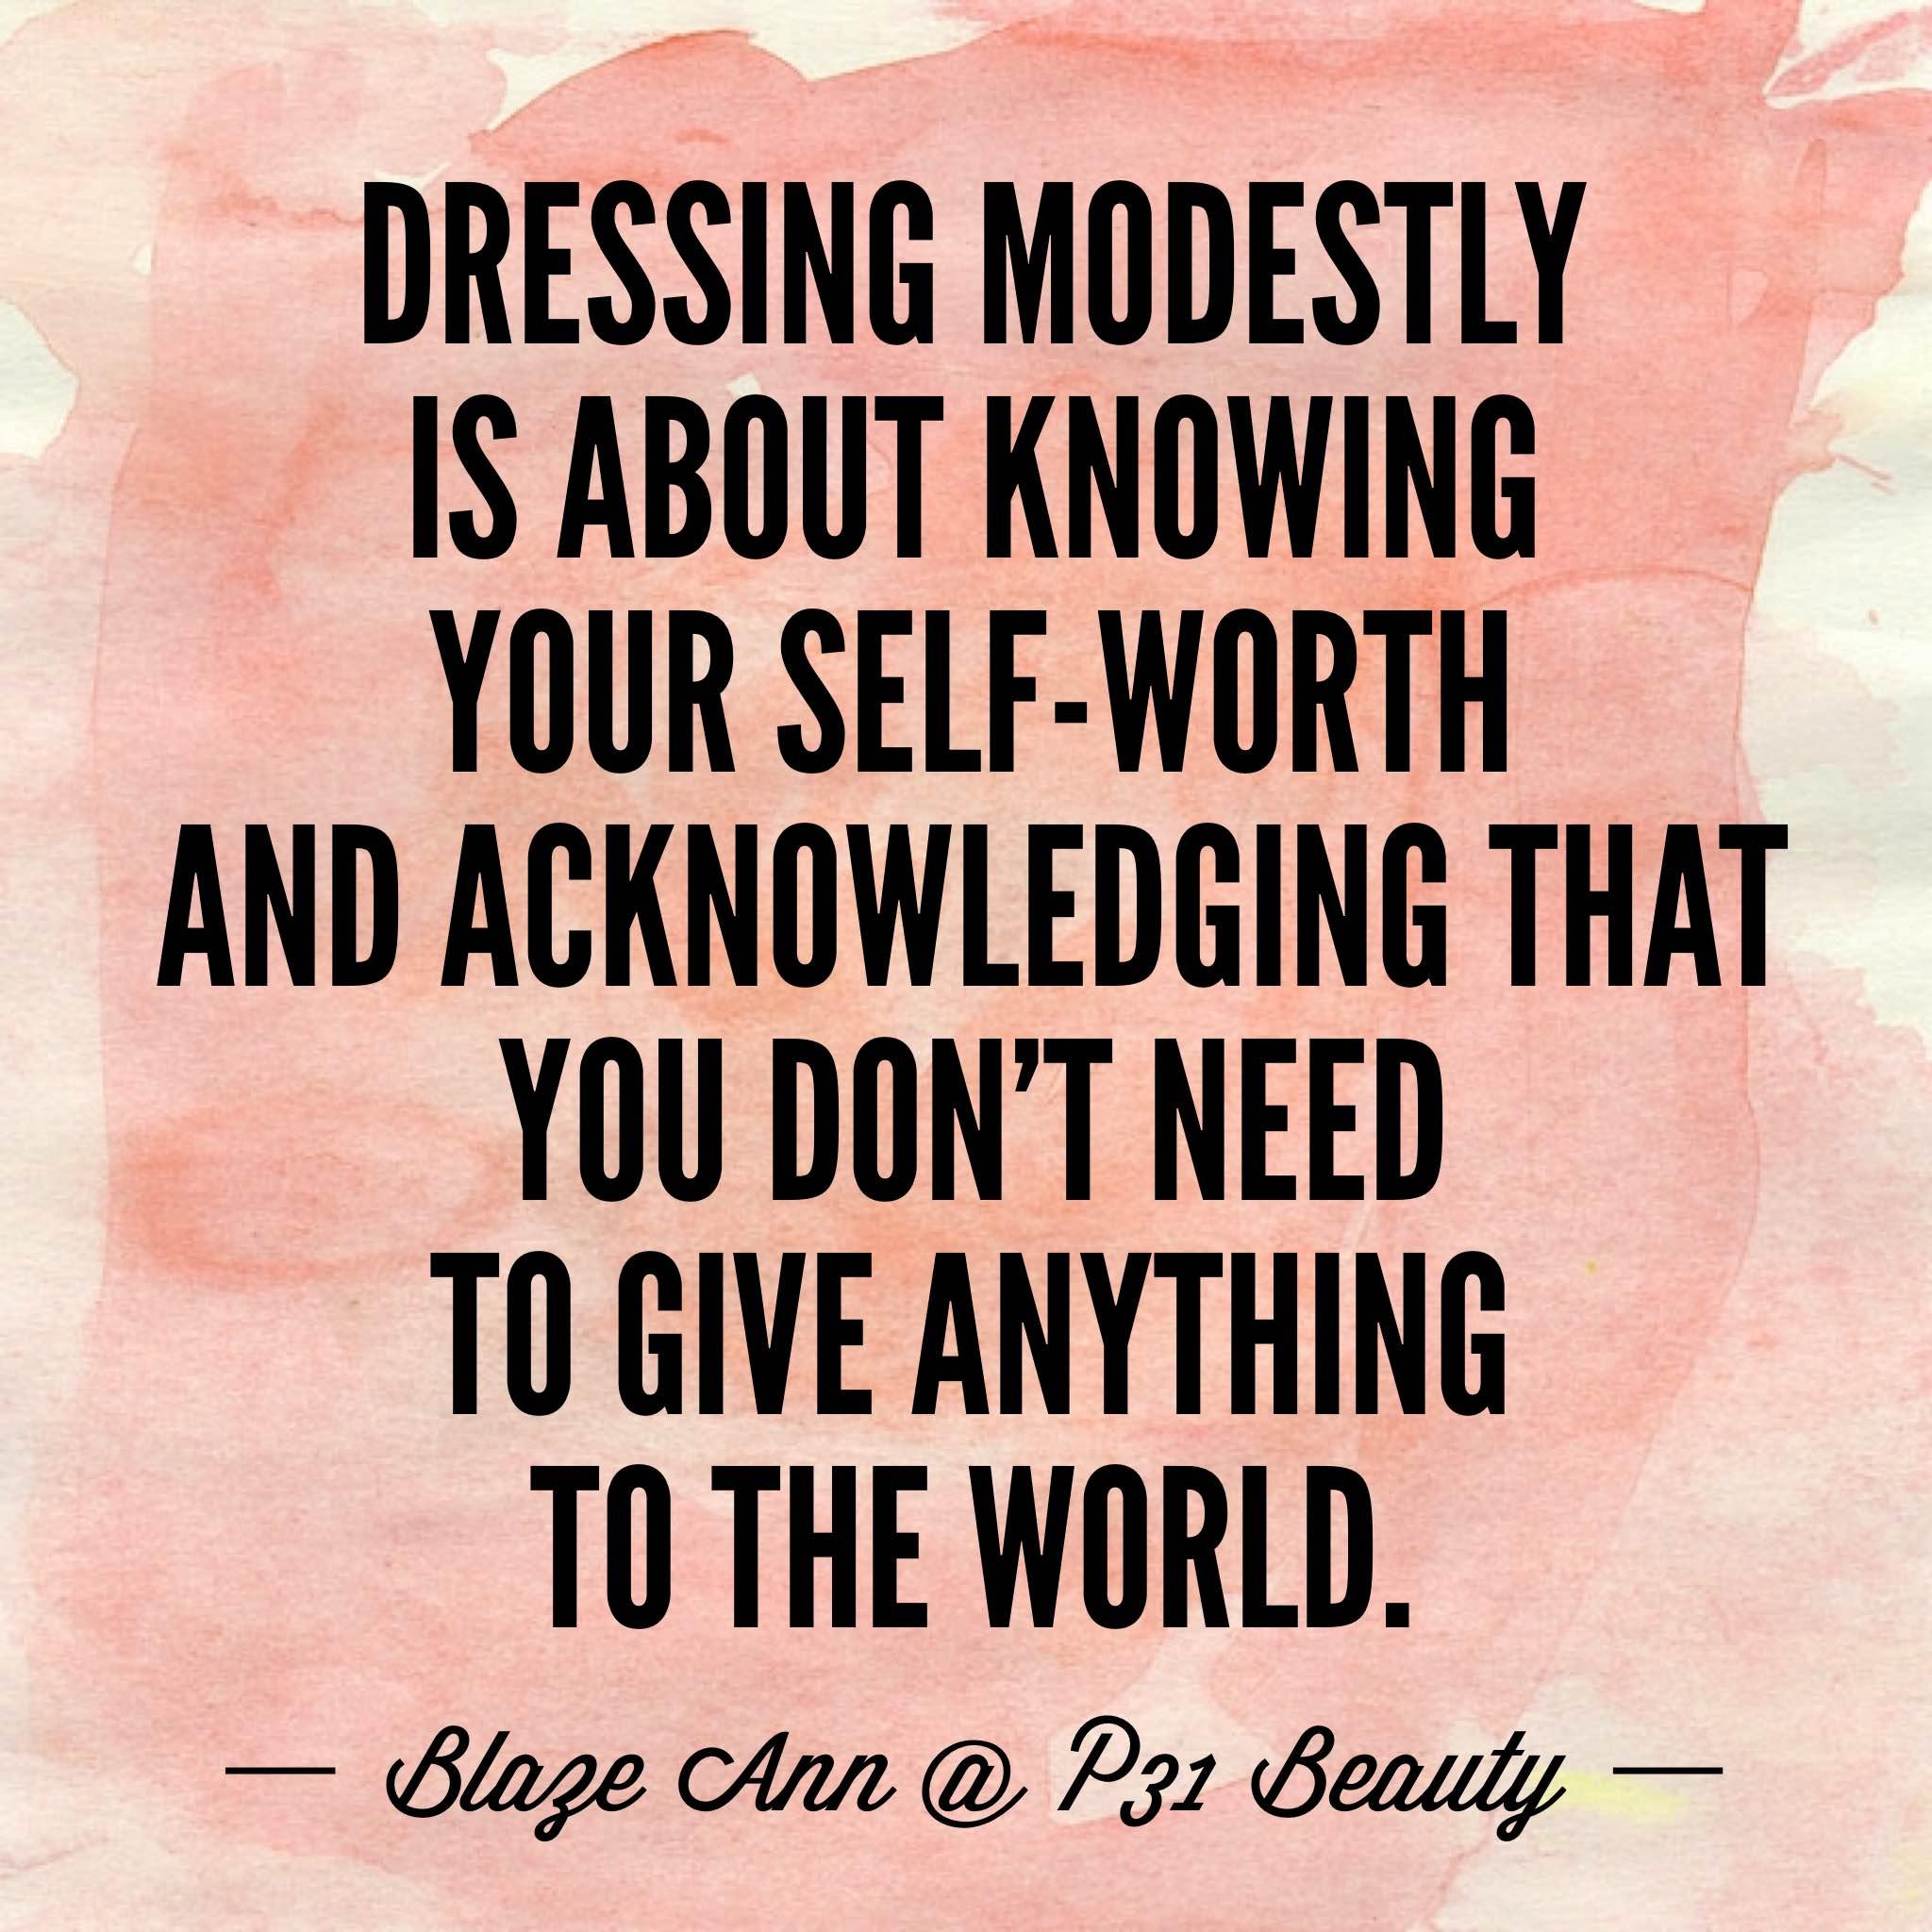 modesty definition bible - studiocrise